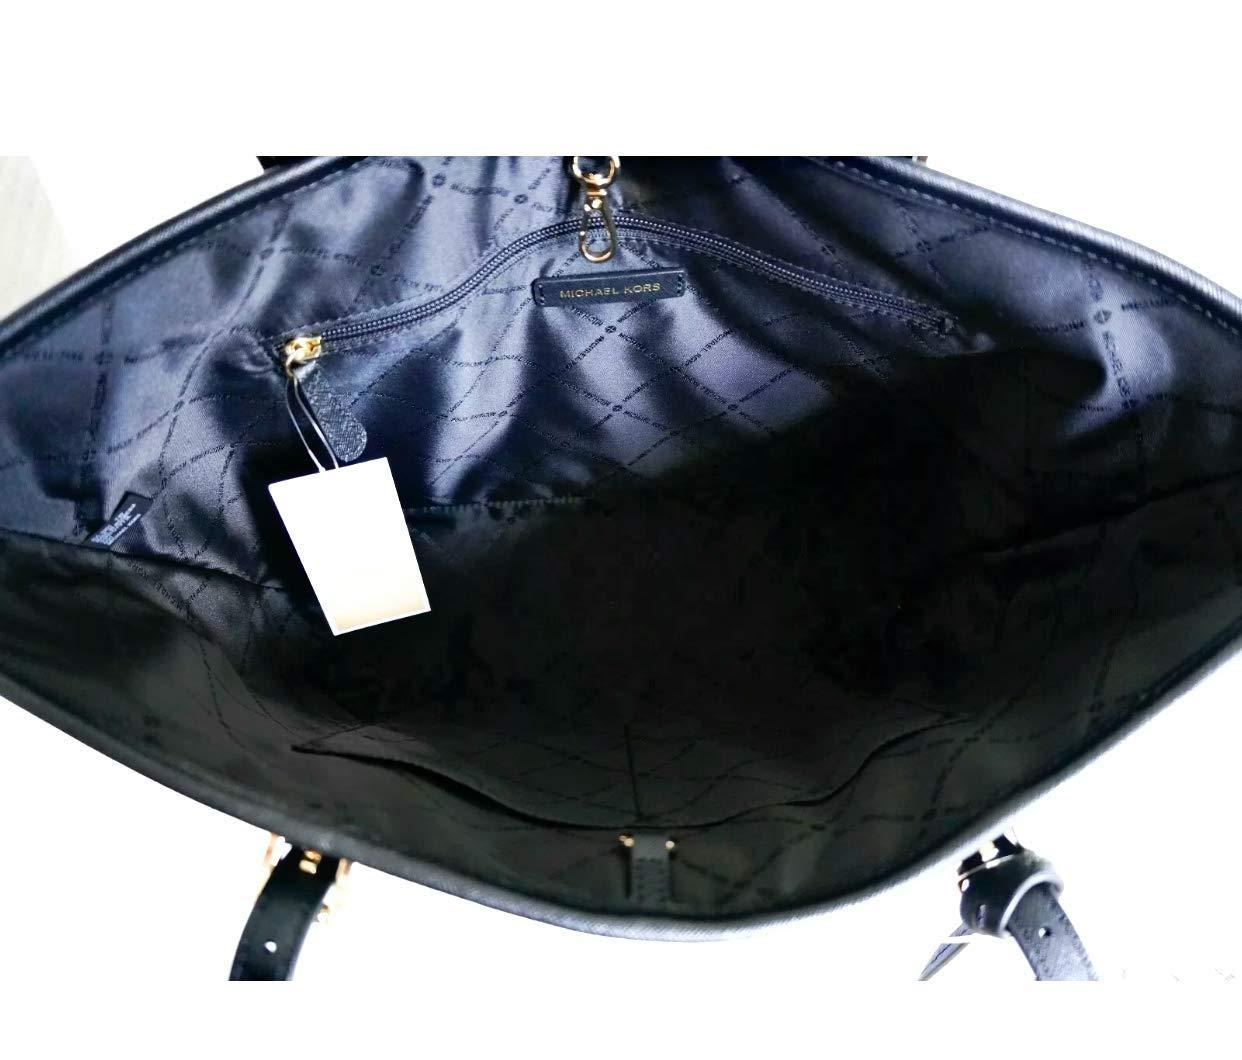 Michael Kors Jet Set Medium Carryall Tote Bag Purse Black by Michael Kors